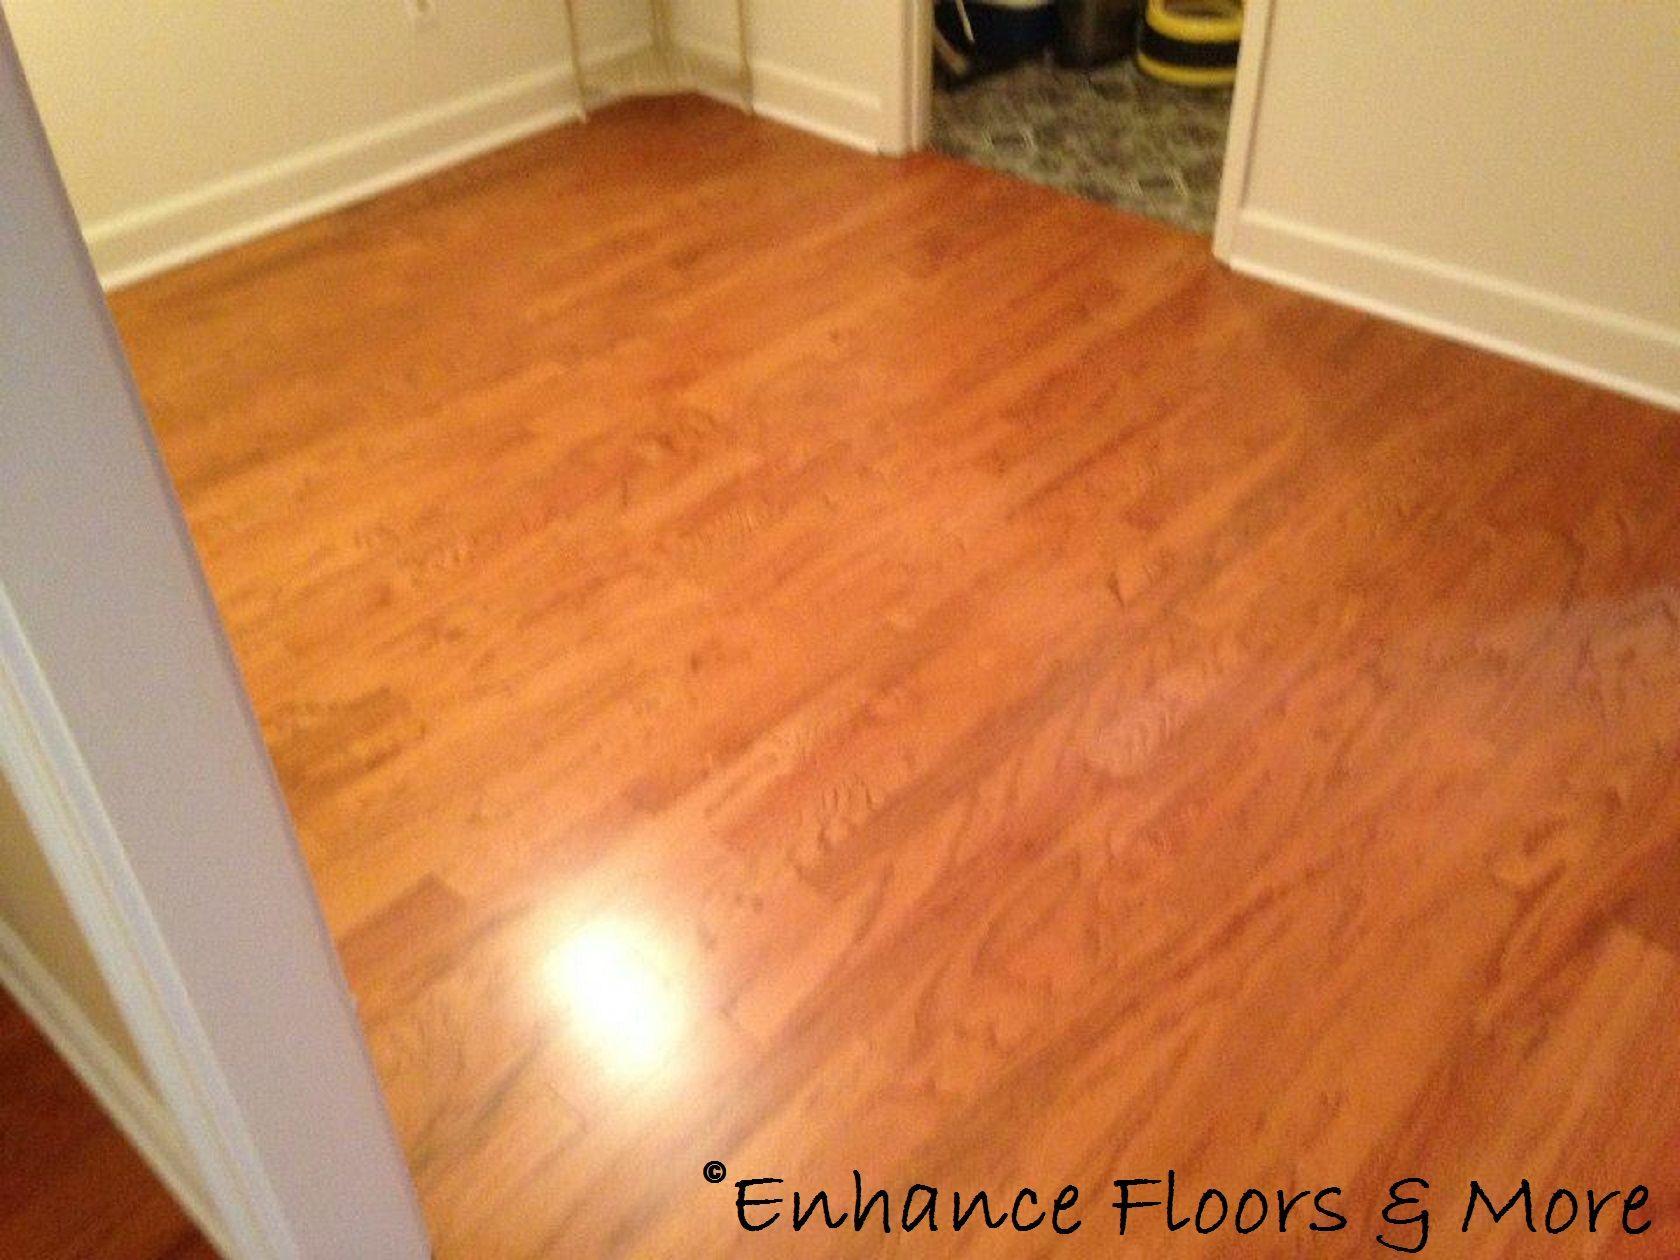 hardwood floor colors images of mohawk flooring prefinished hardwood floor fairlain oak 3 8 x 3 within mohawk flooring prefinished hardwood floor fairlain oak 3 8 x 3 color golden